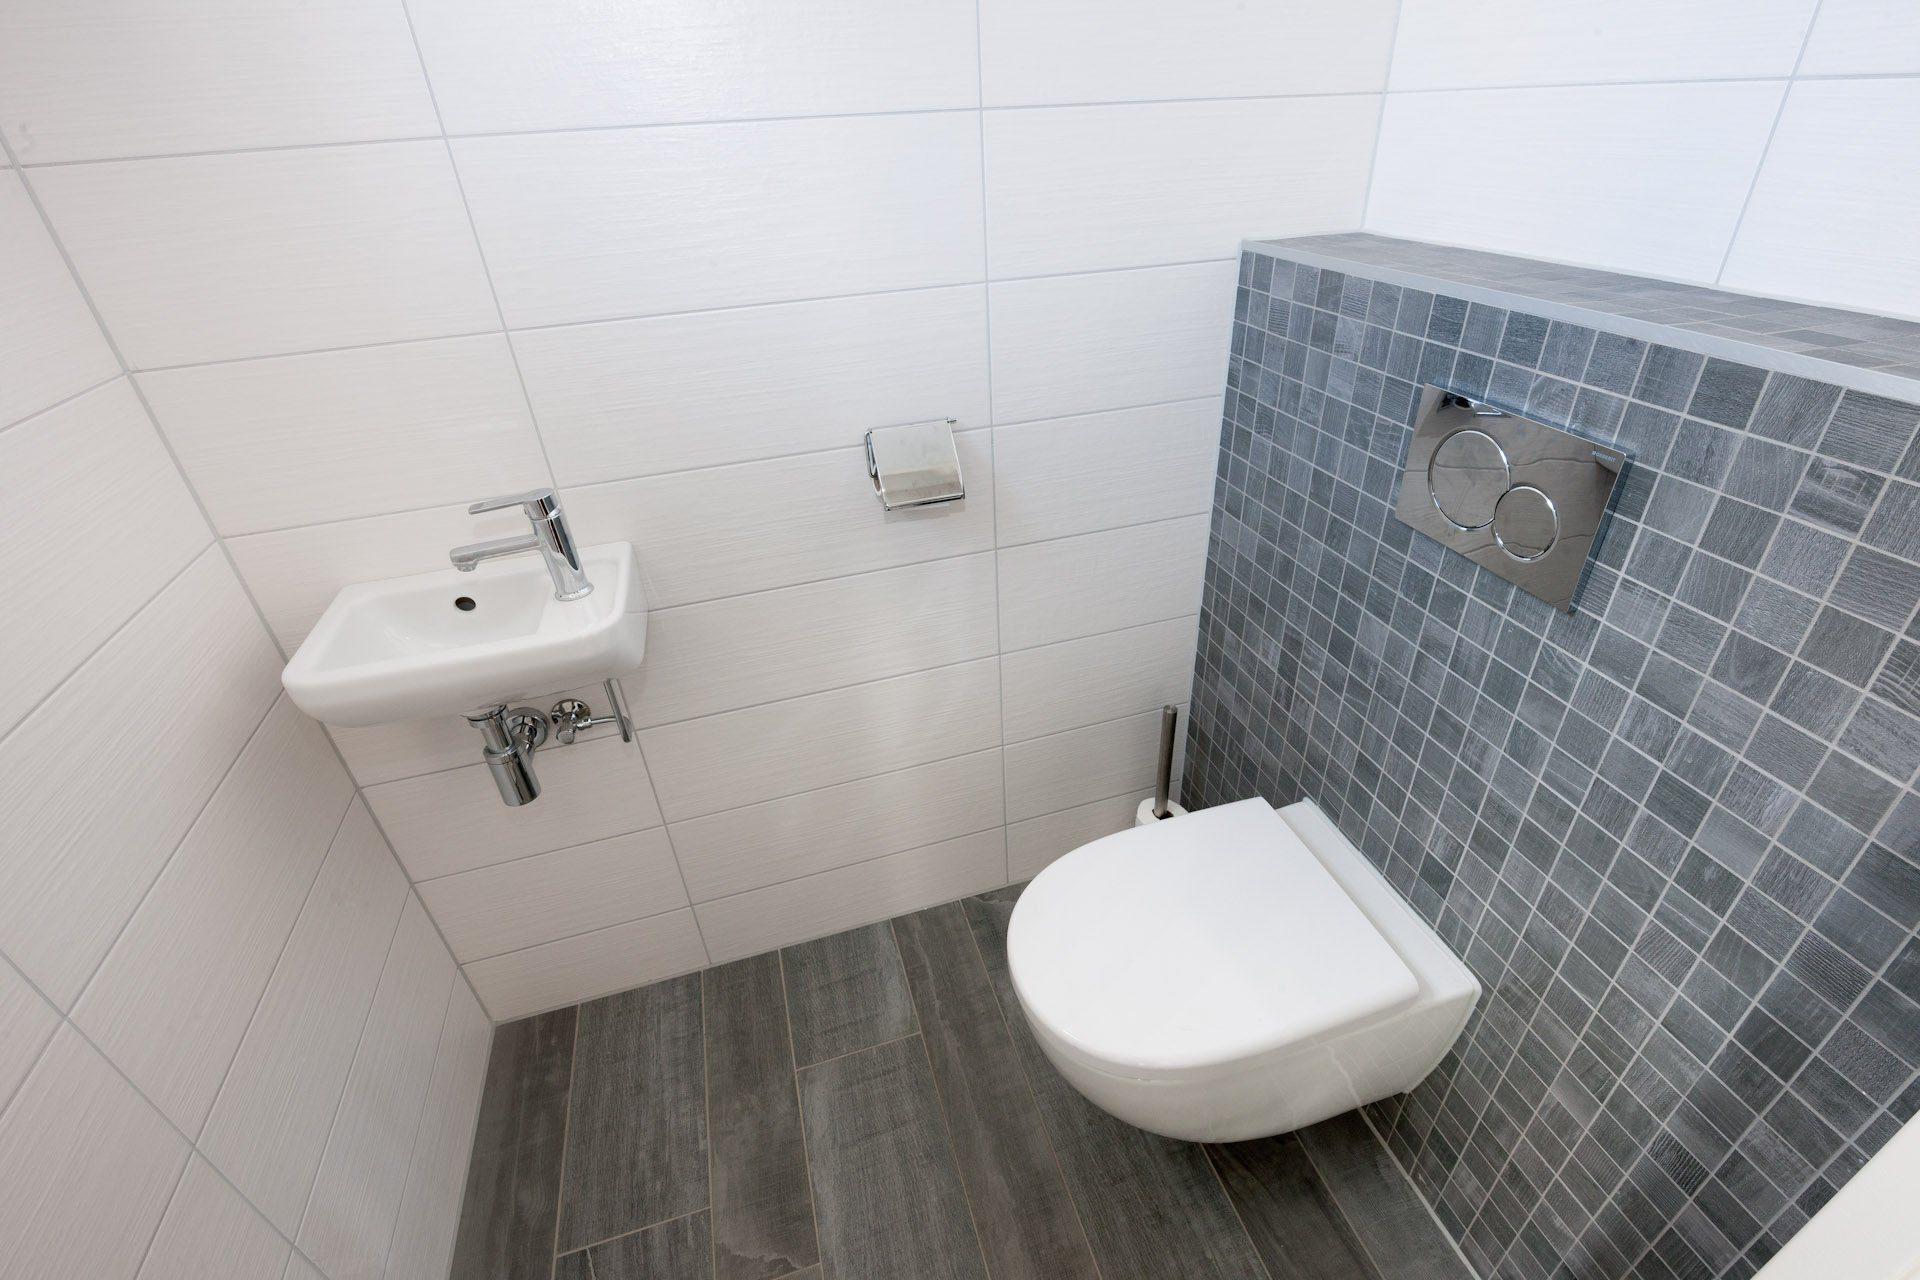 Houtlook tegels in woonkamer en mozaek in toilet  KROON